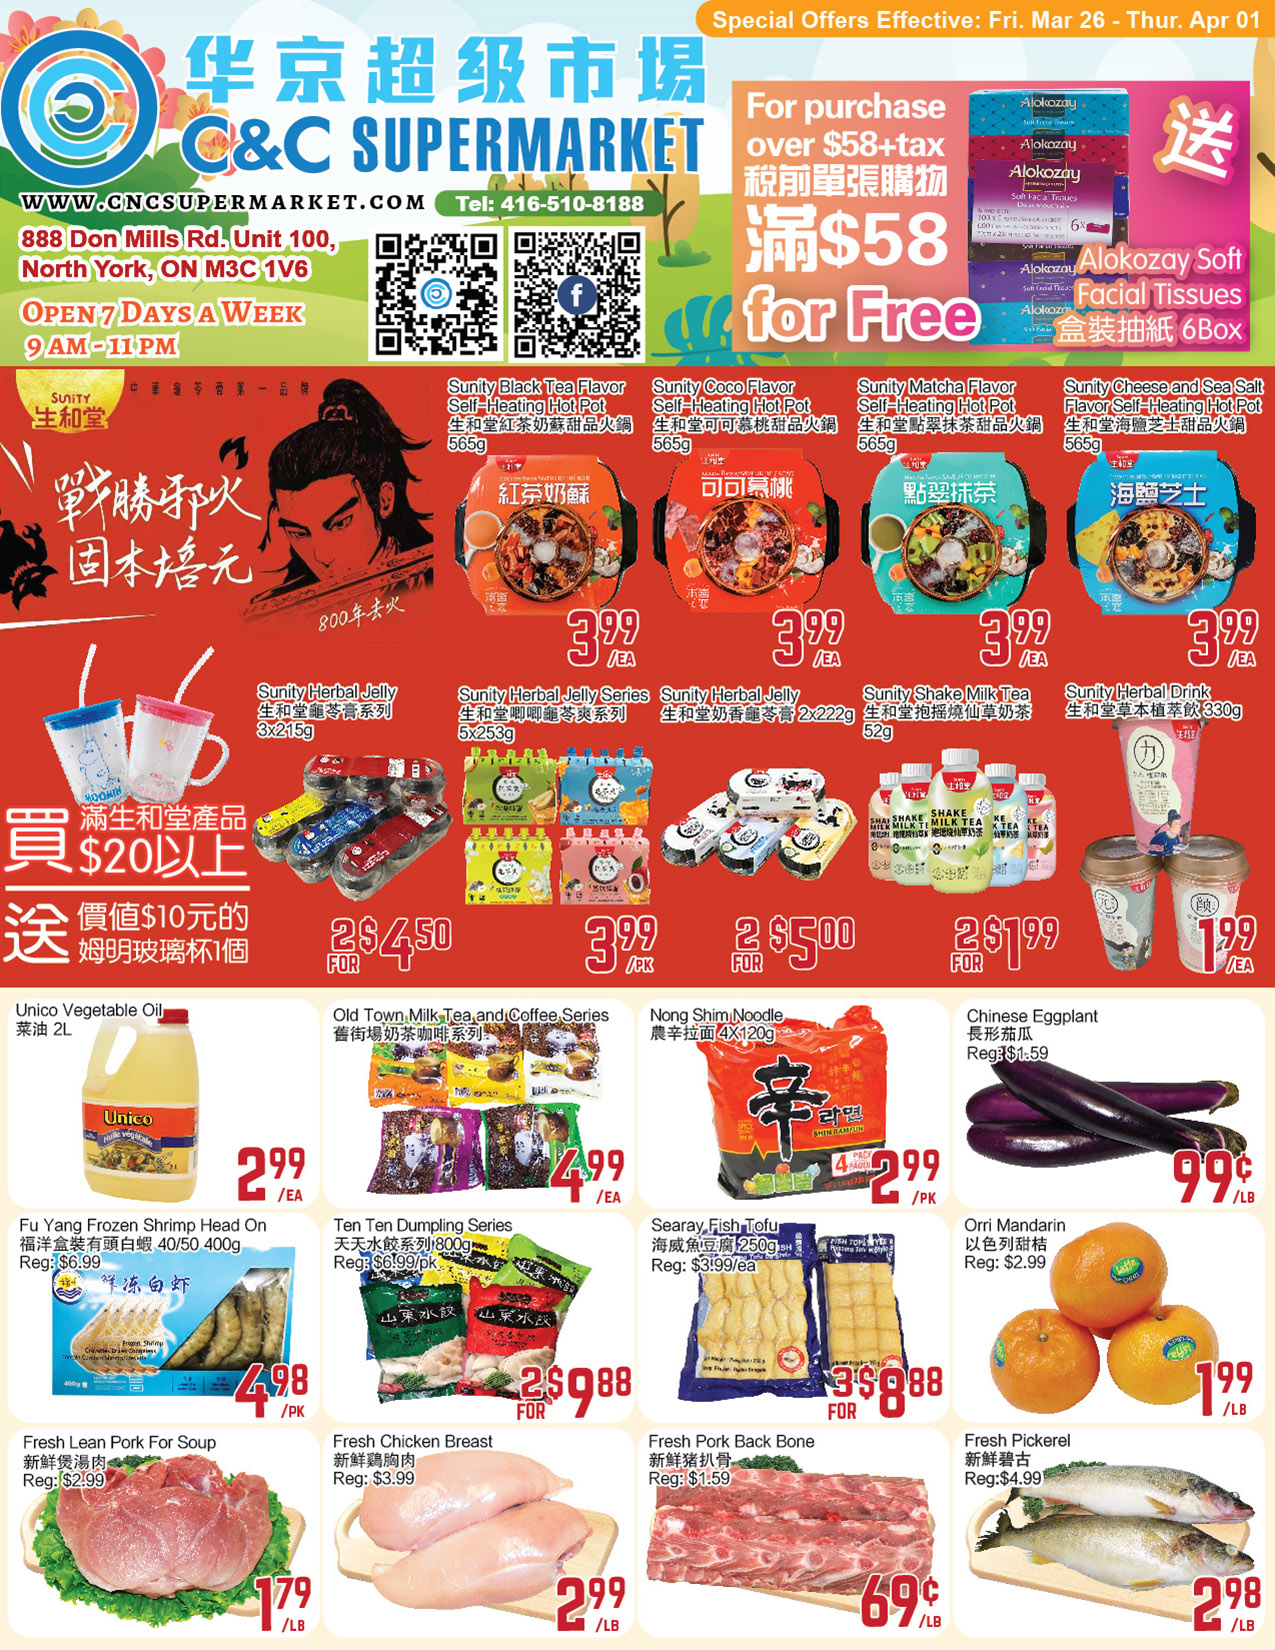 C&C Supermarket Flyer Mar 26